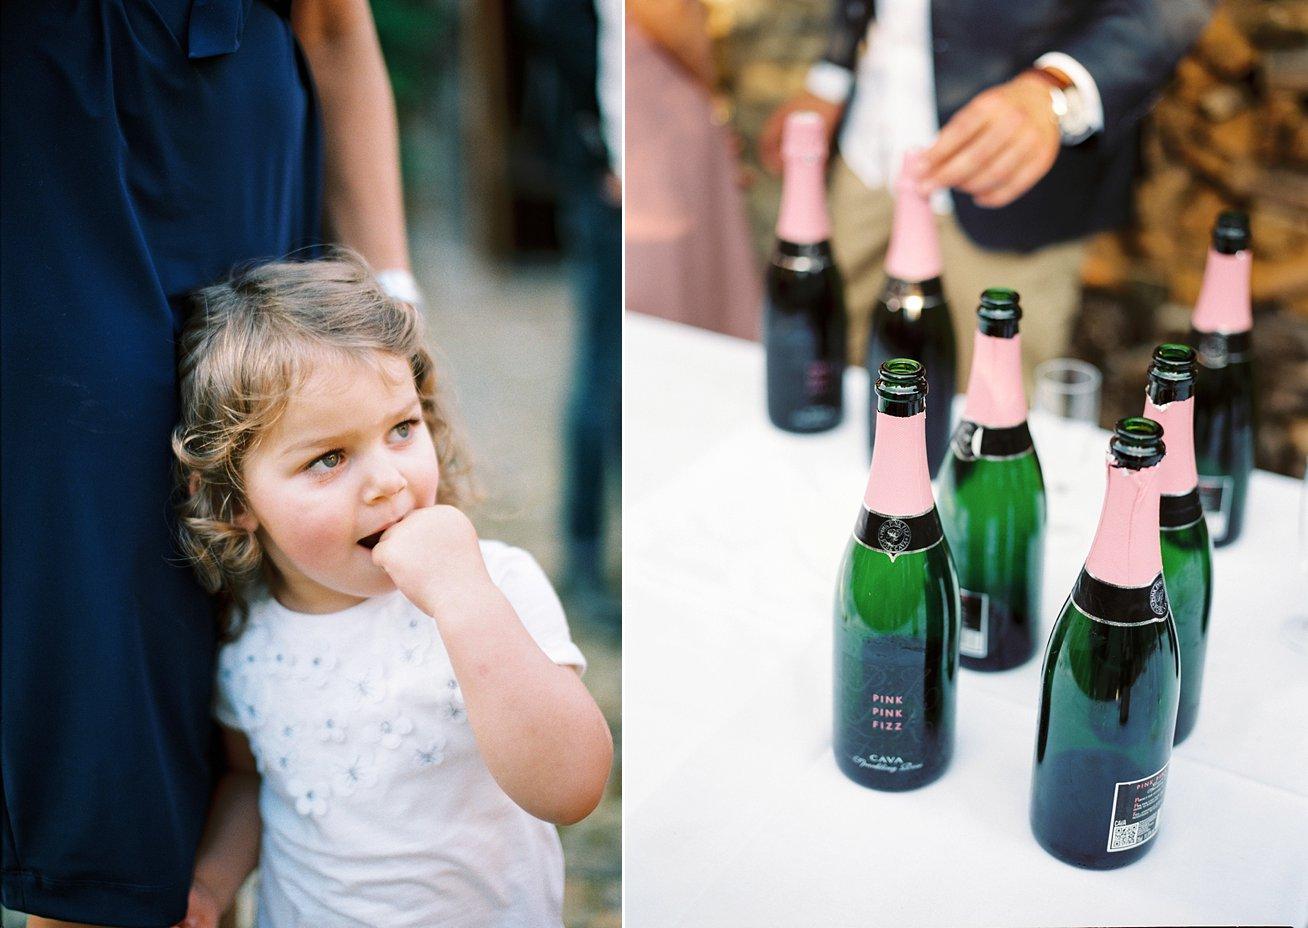 Amanda-Drost-photography-wedding-bruioft-zuid-limburg-hoeve-vernelsveld_0044.jpg